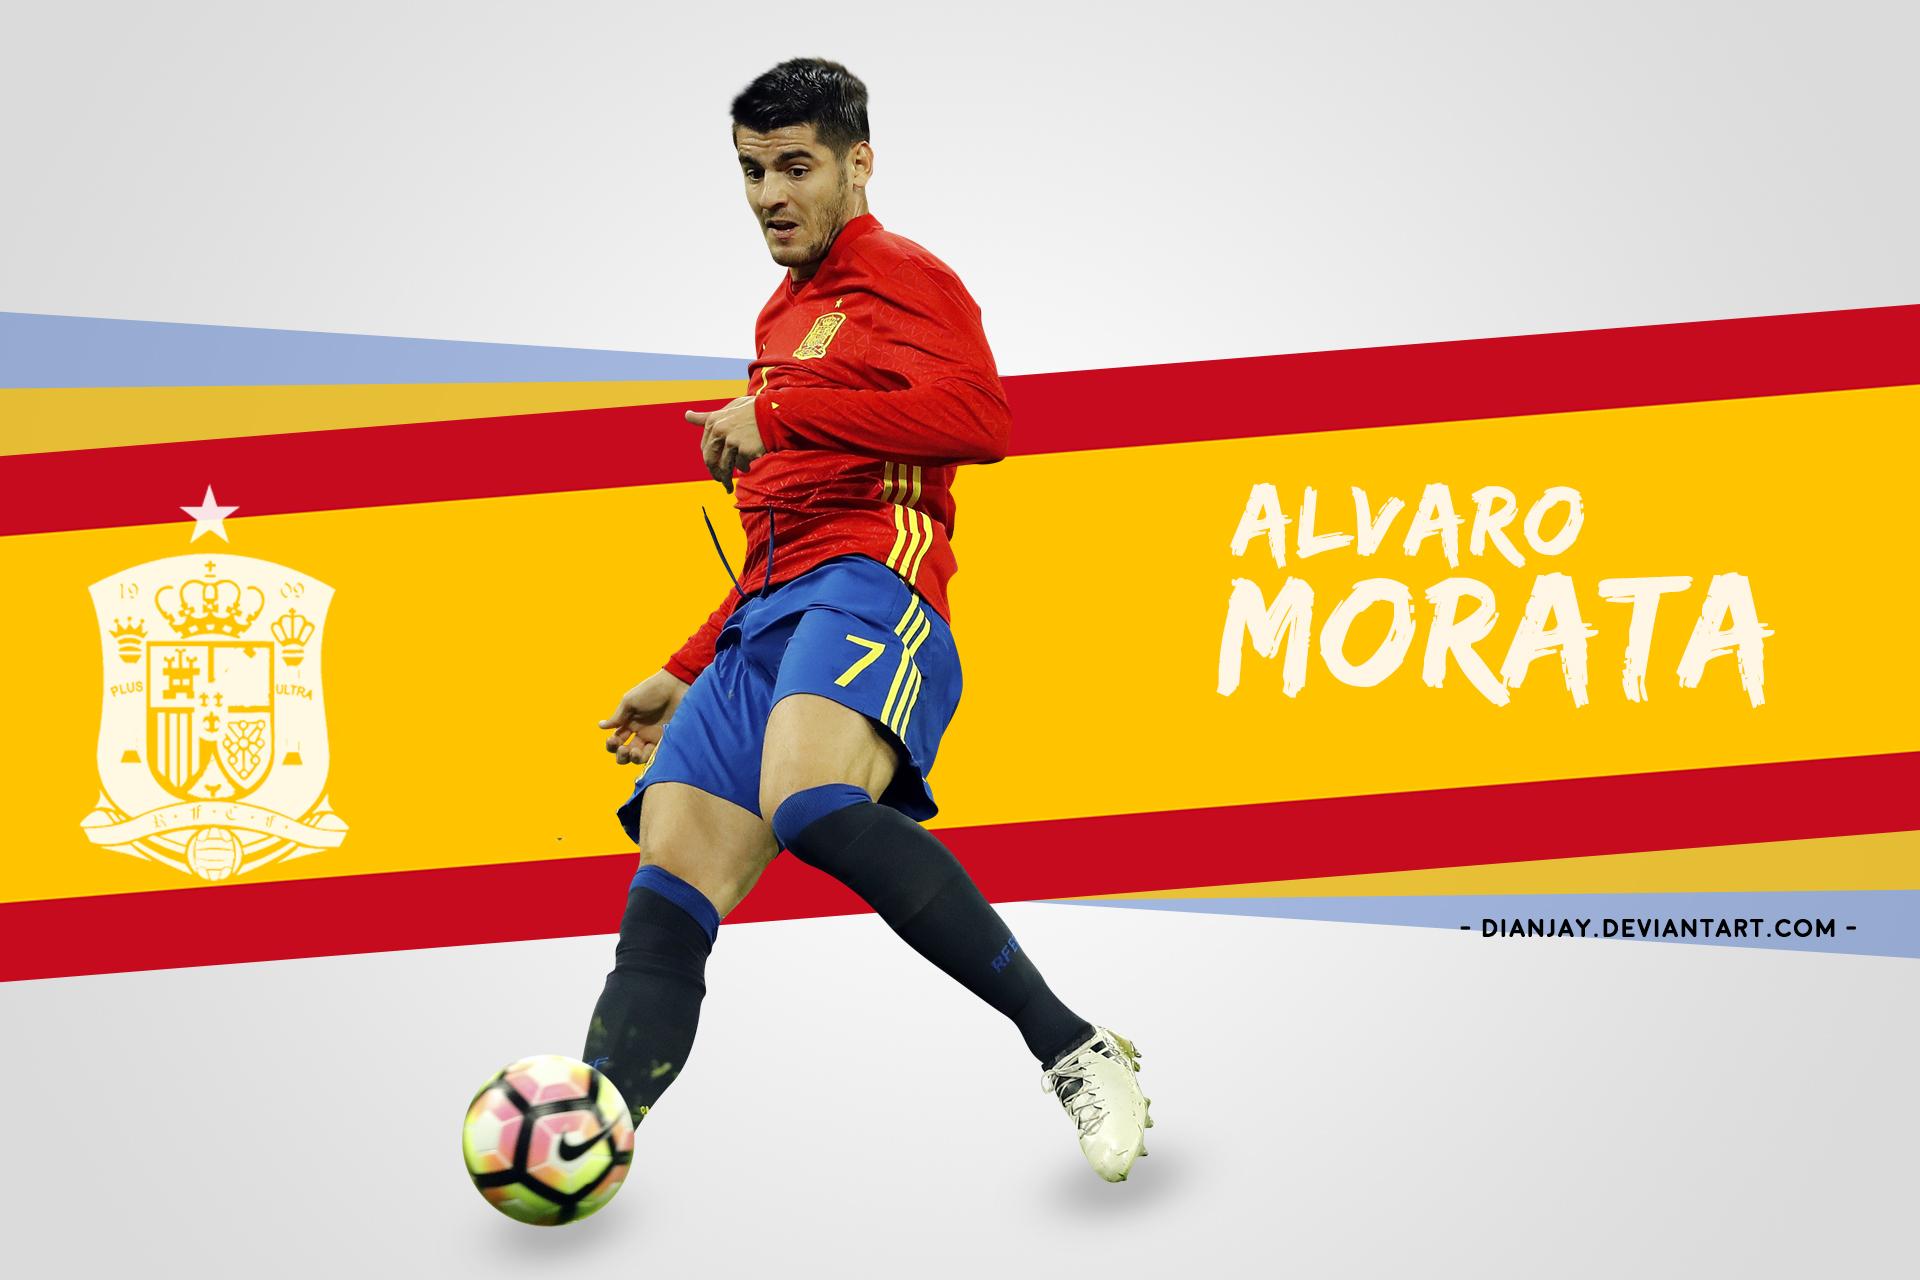 Alvaro Morata Wallpaper Desktop 2017/18 By Dianjay On